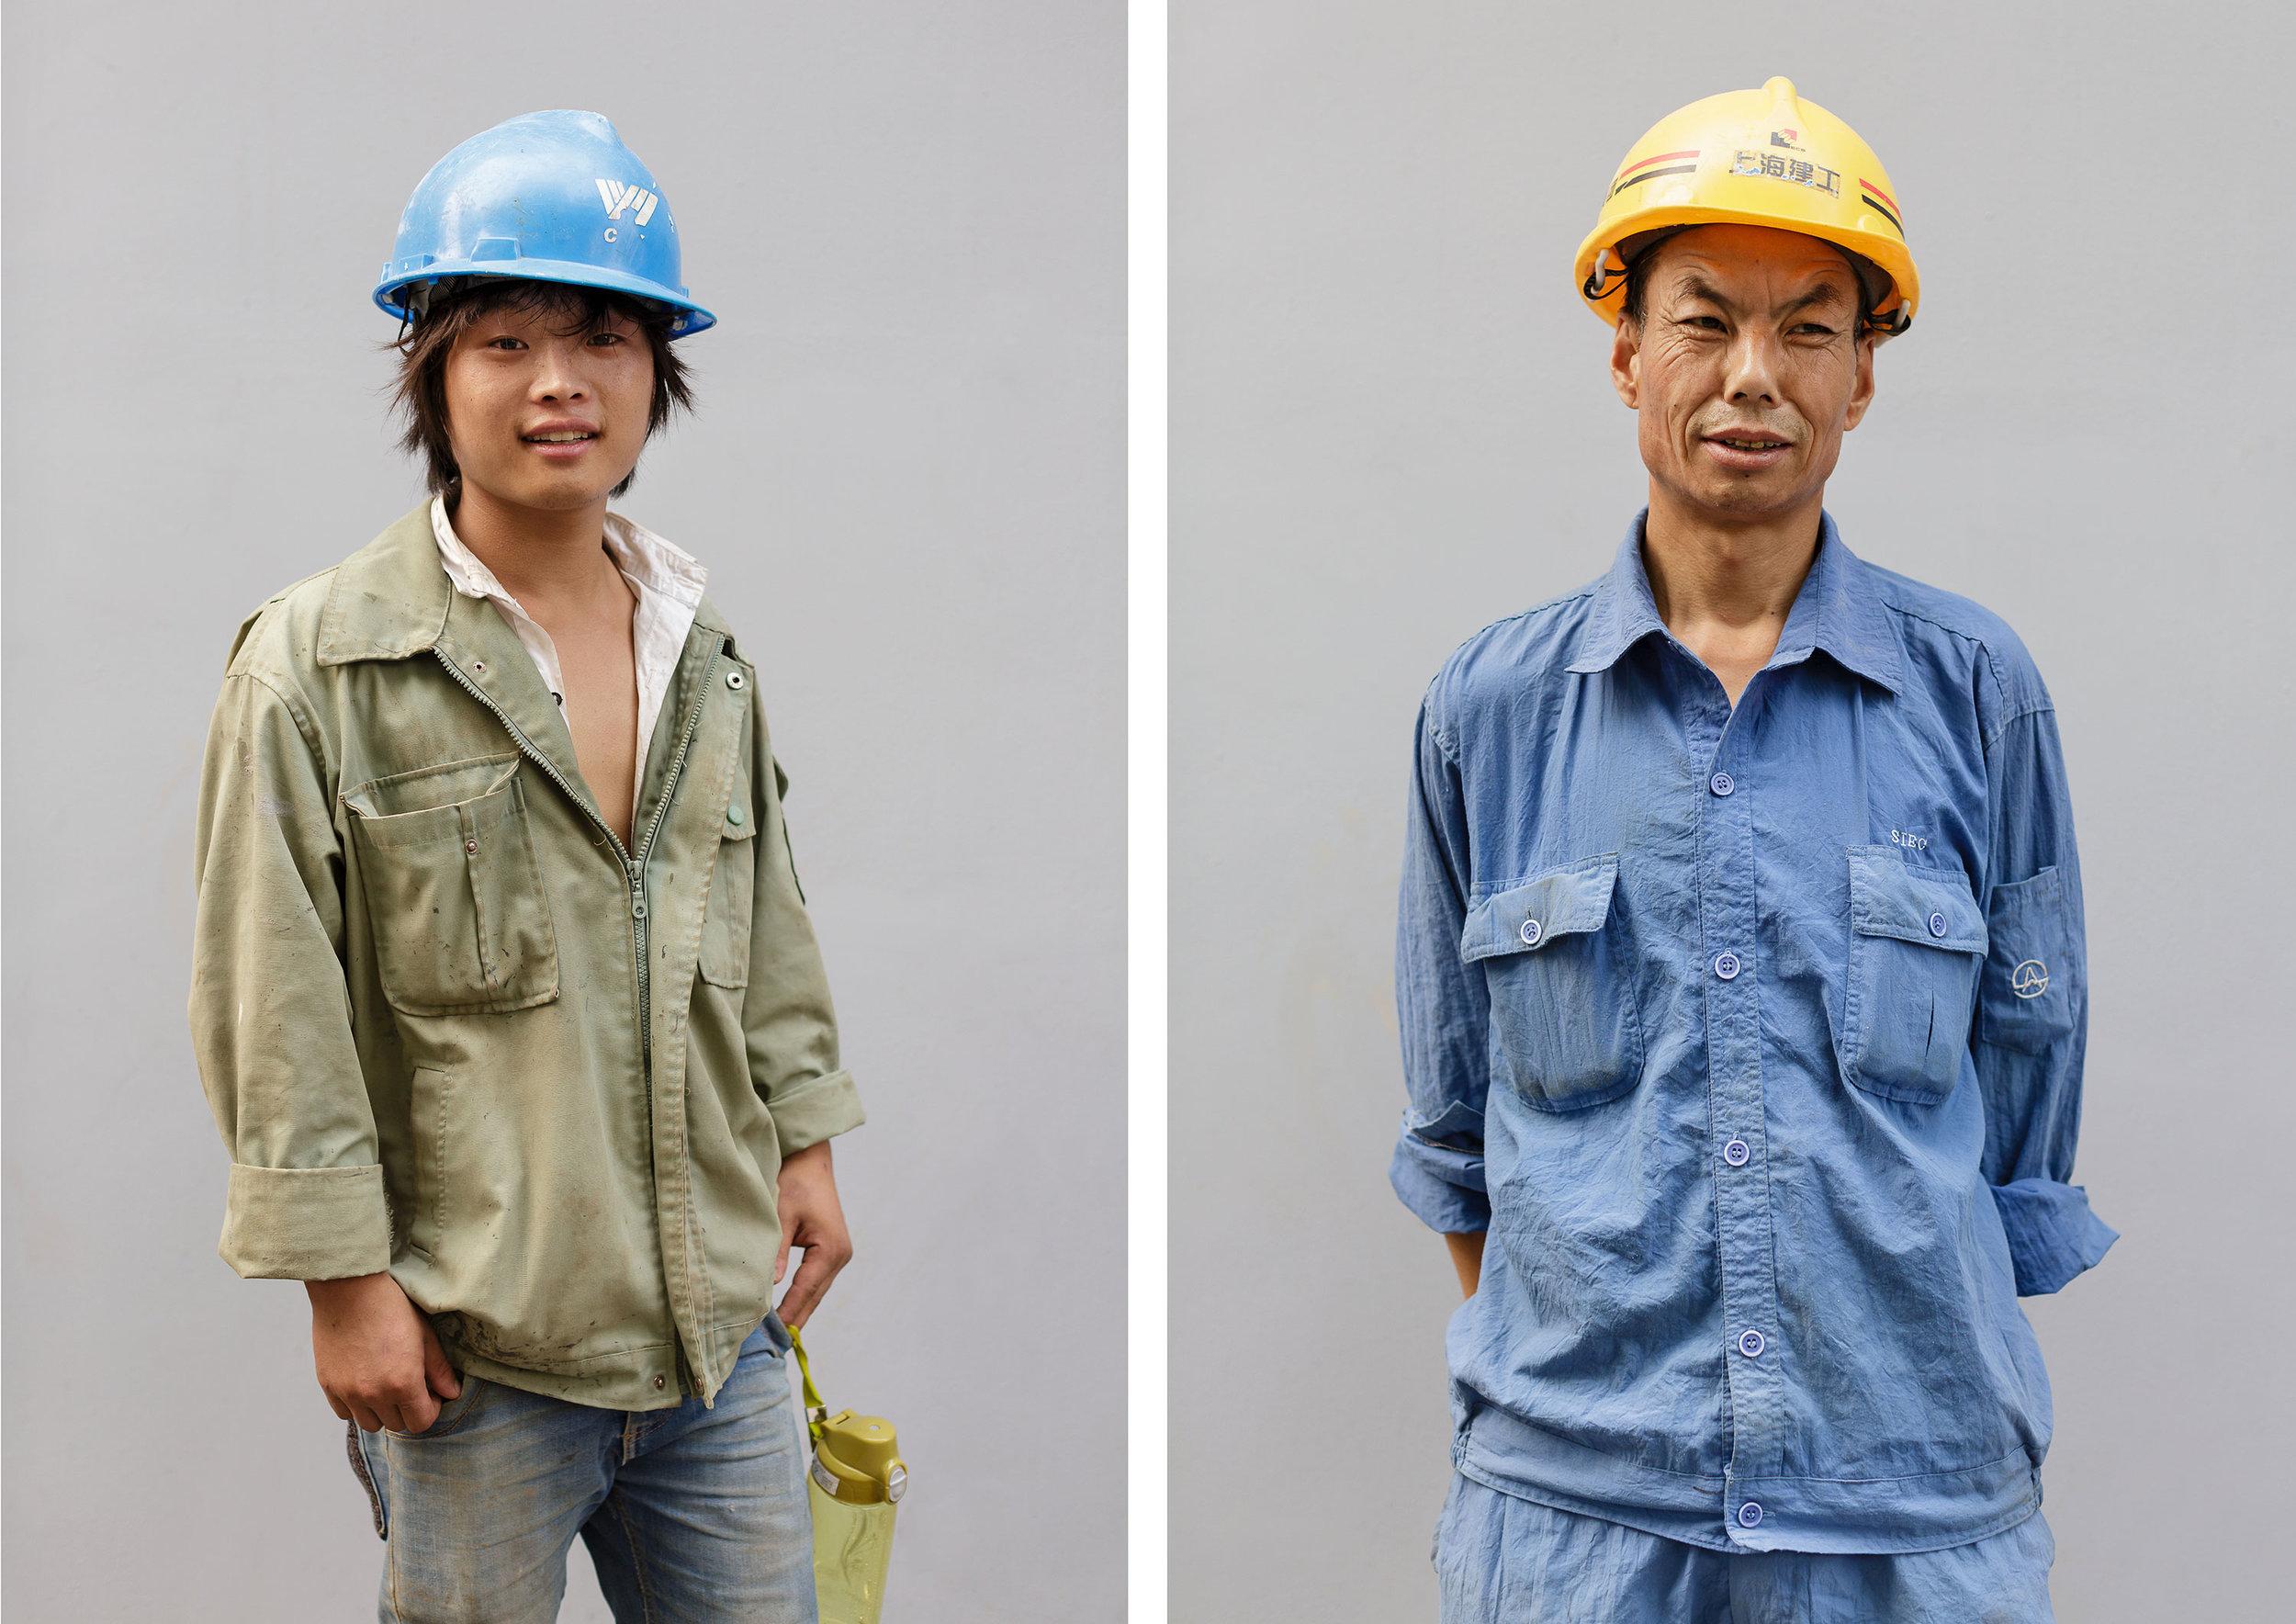 Shanghai_Tower-workers-and-building5.jpg